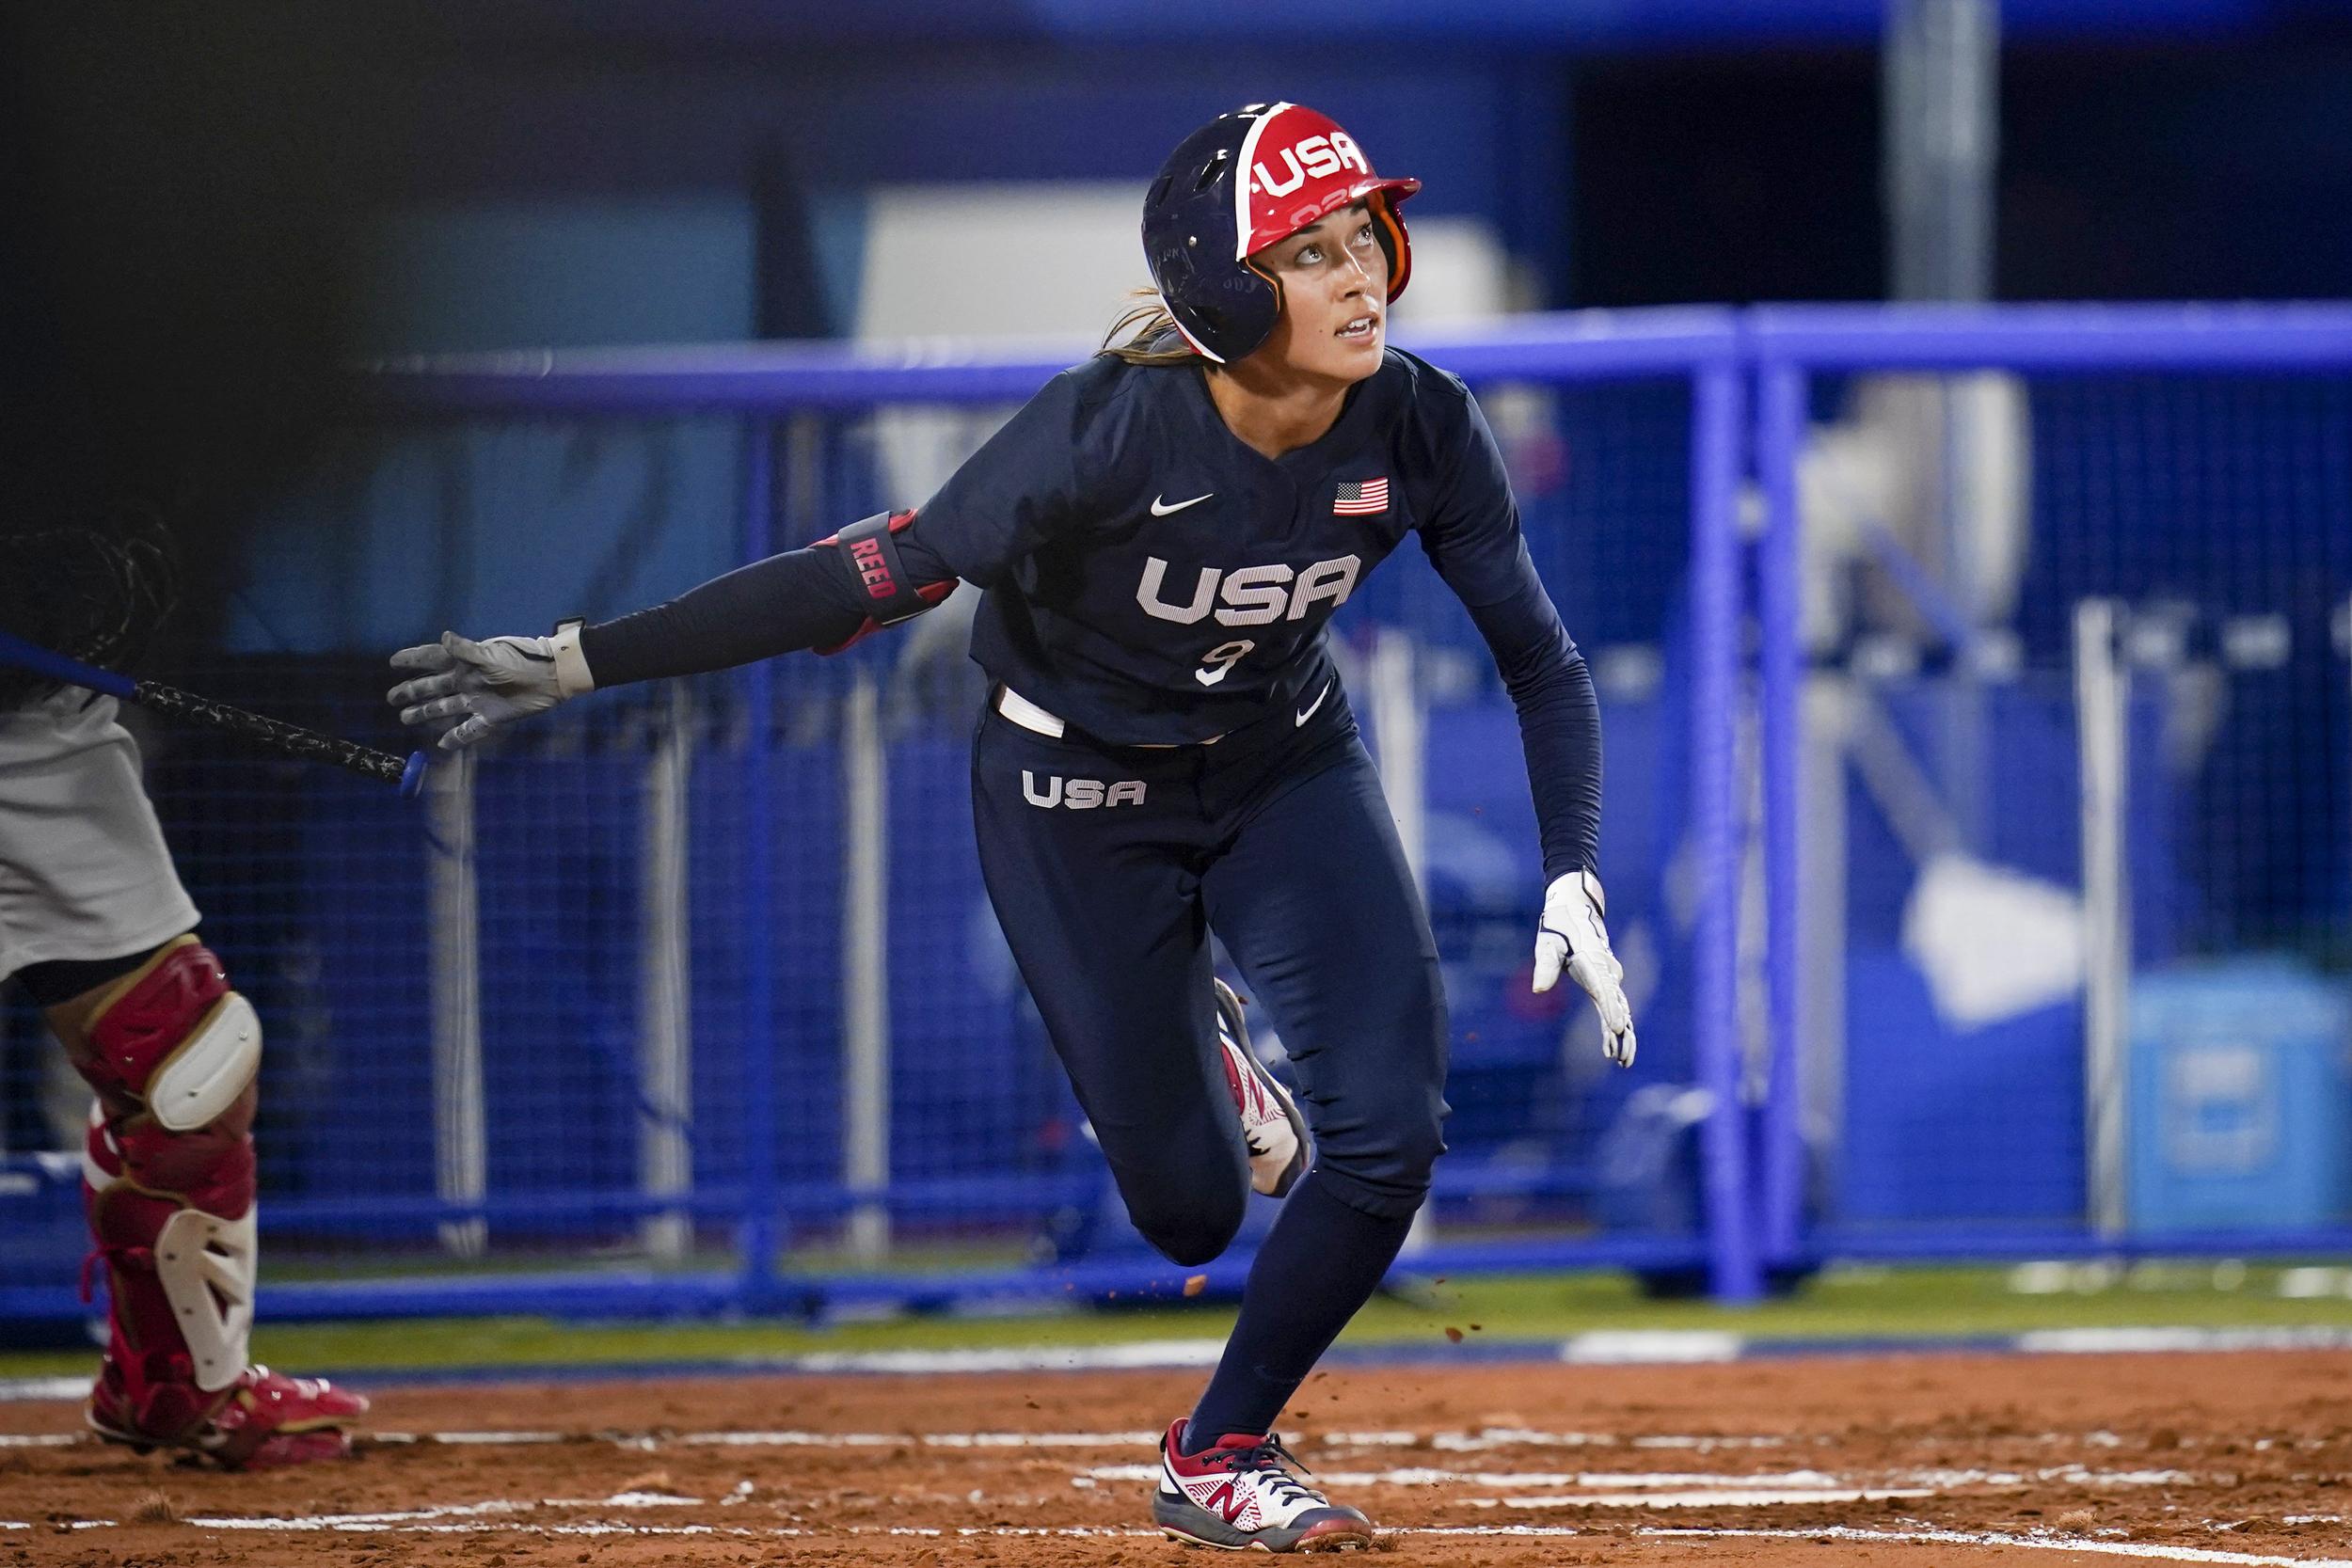 Japan wins softball gold, defeats U.S. in Olympics rematch